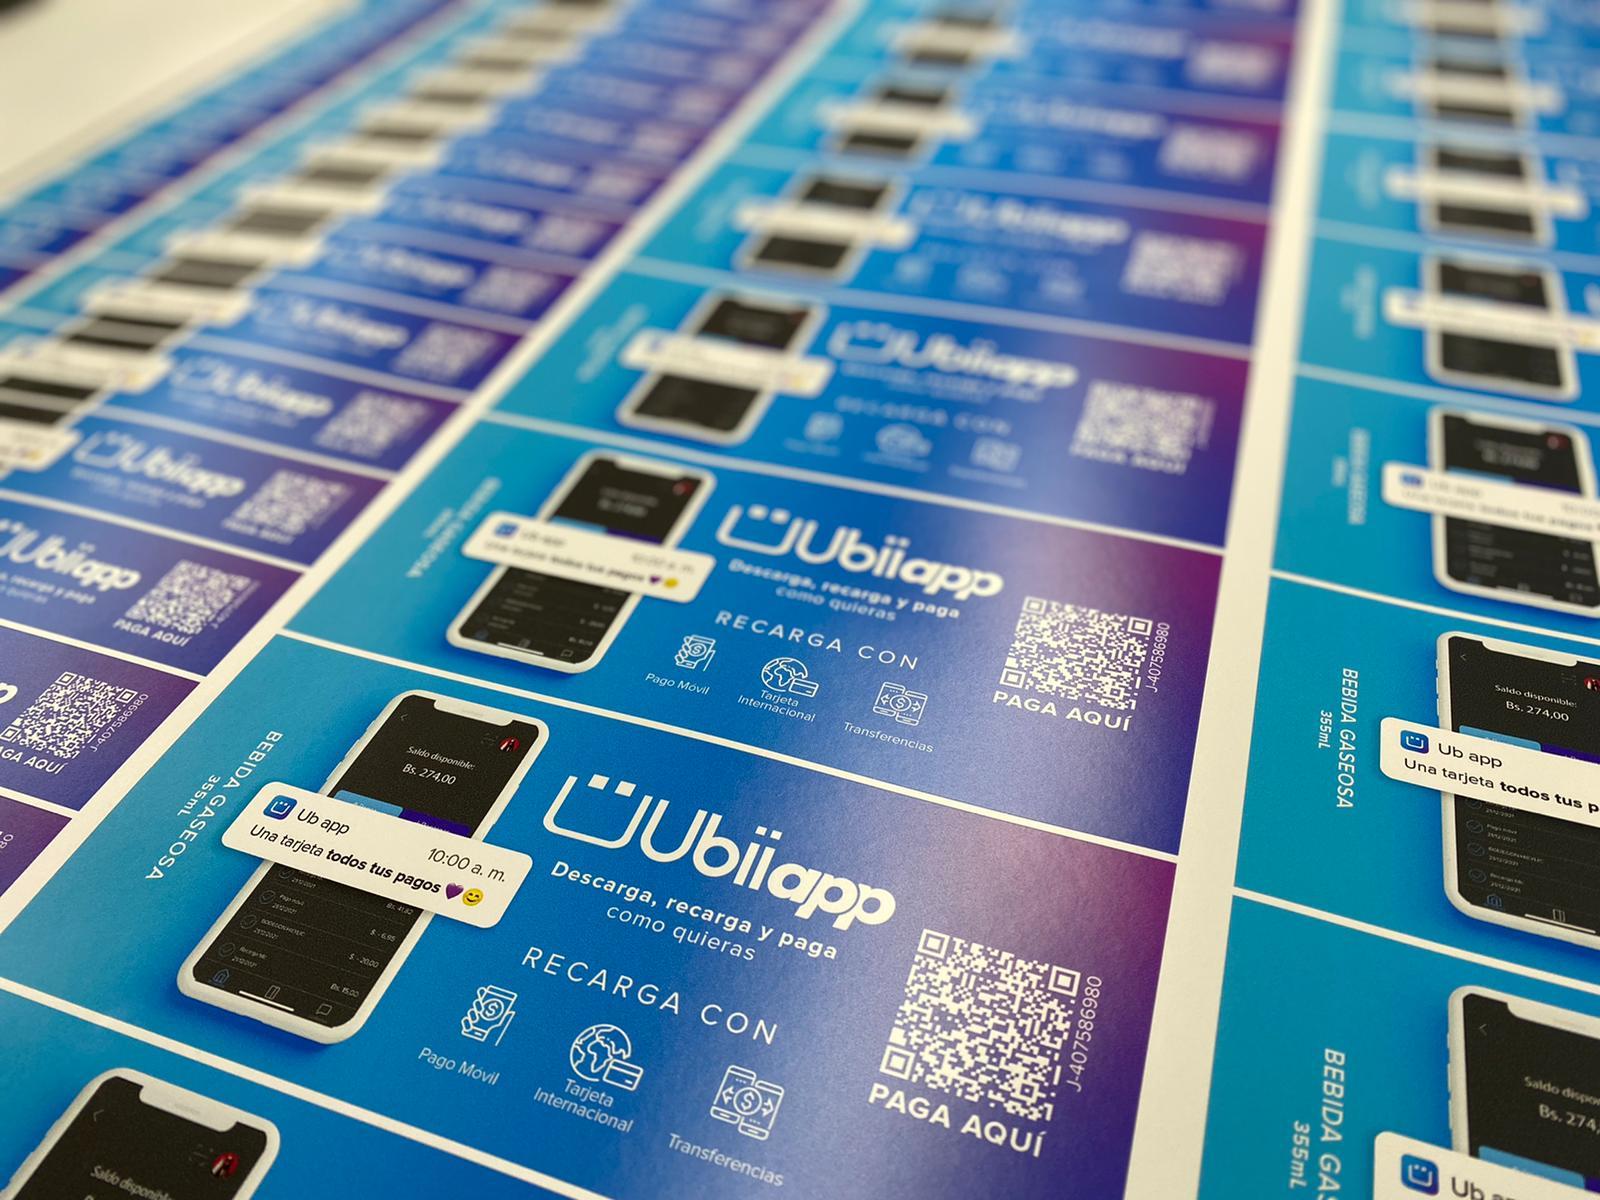 Business Card for Wesmi)e